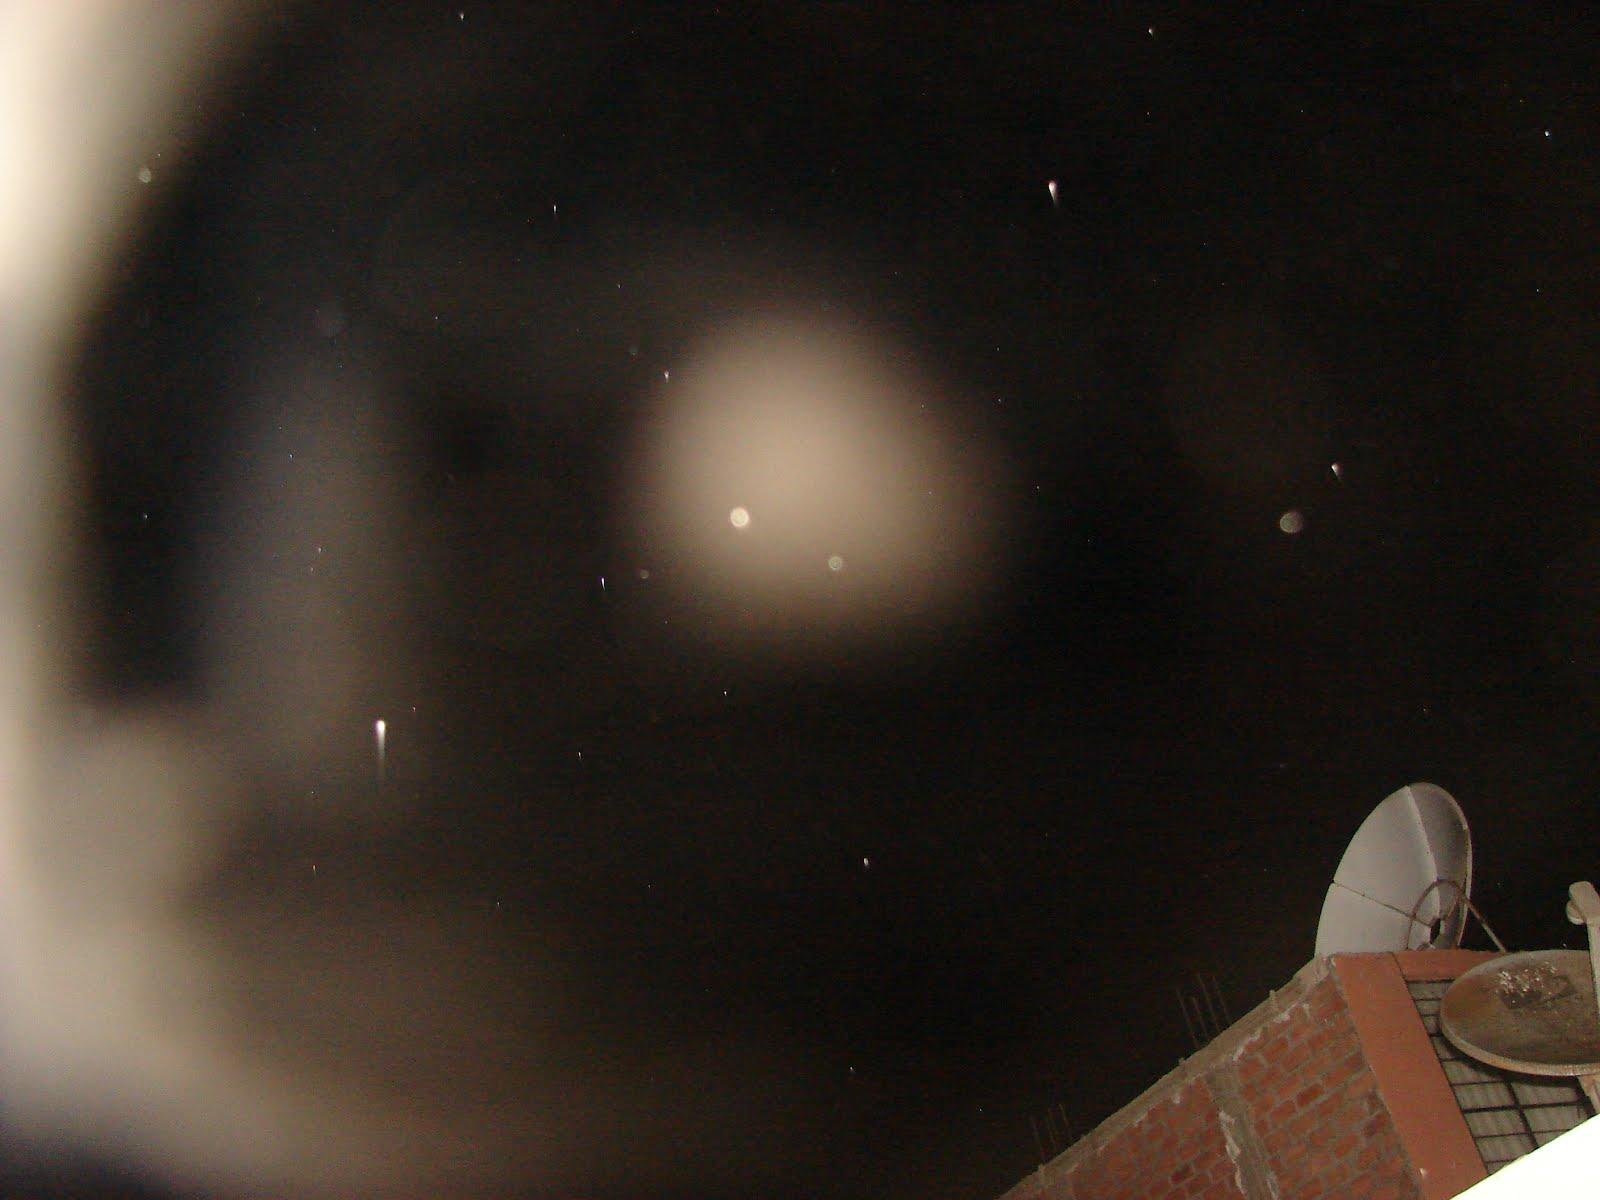 Atencion.2-febrero-3-4-5-6-7...2012 esferas ET,Ovni-subiendo al Cielo sec-ufo-xFito.33.p.